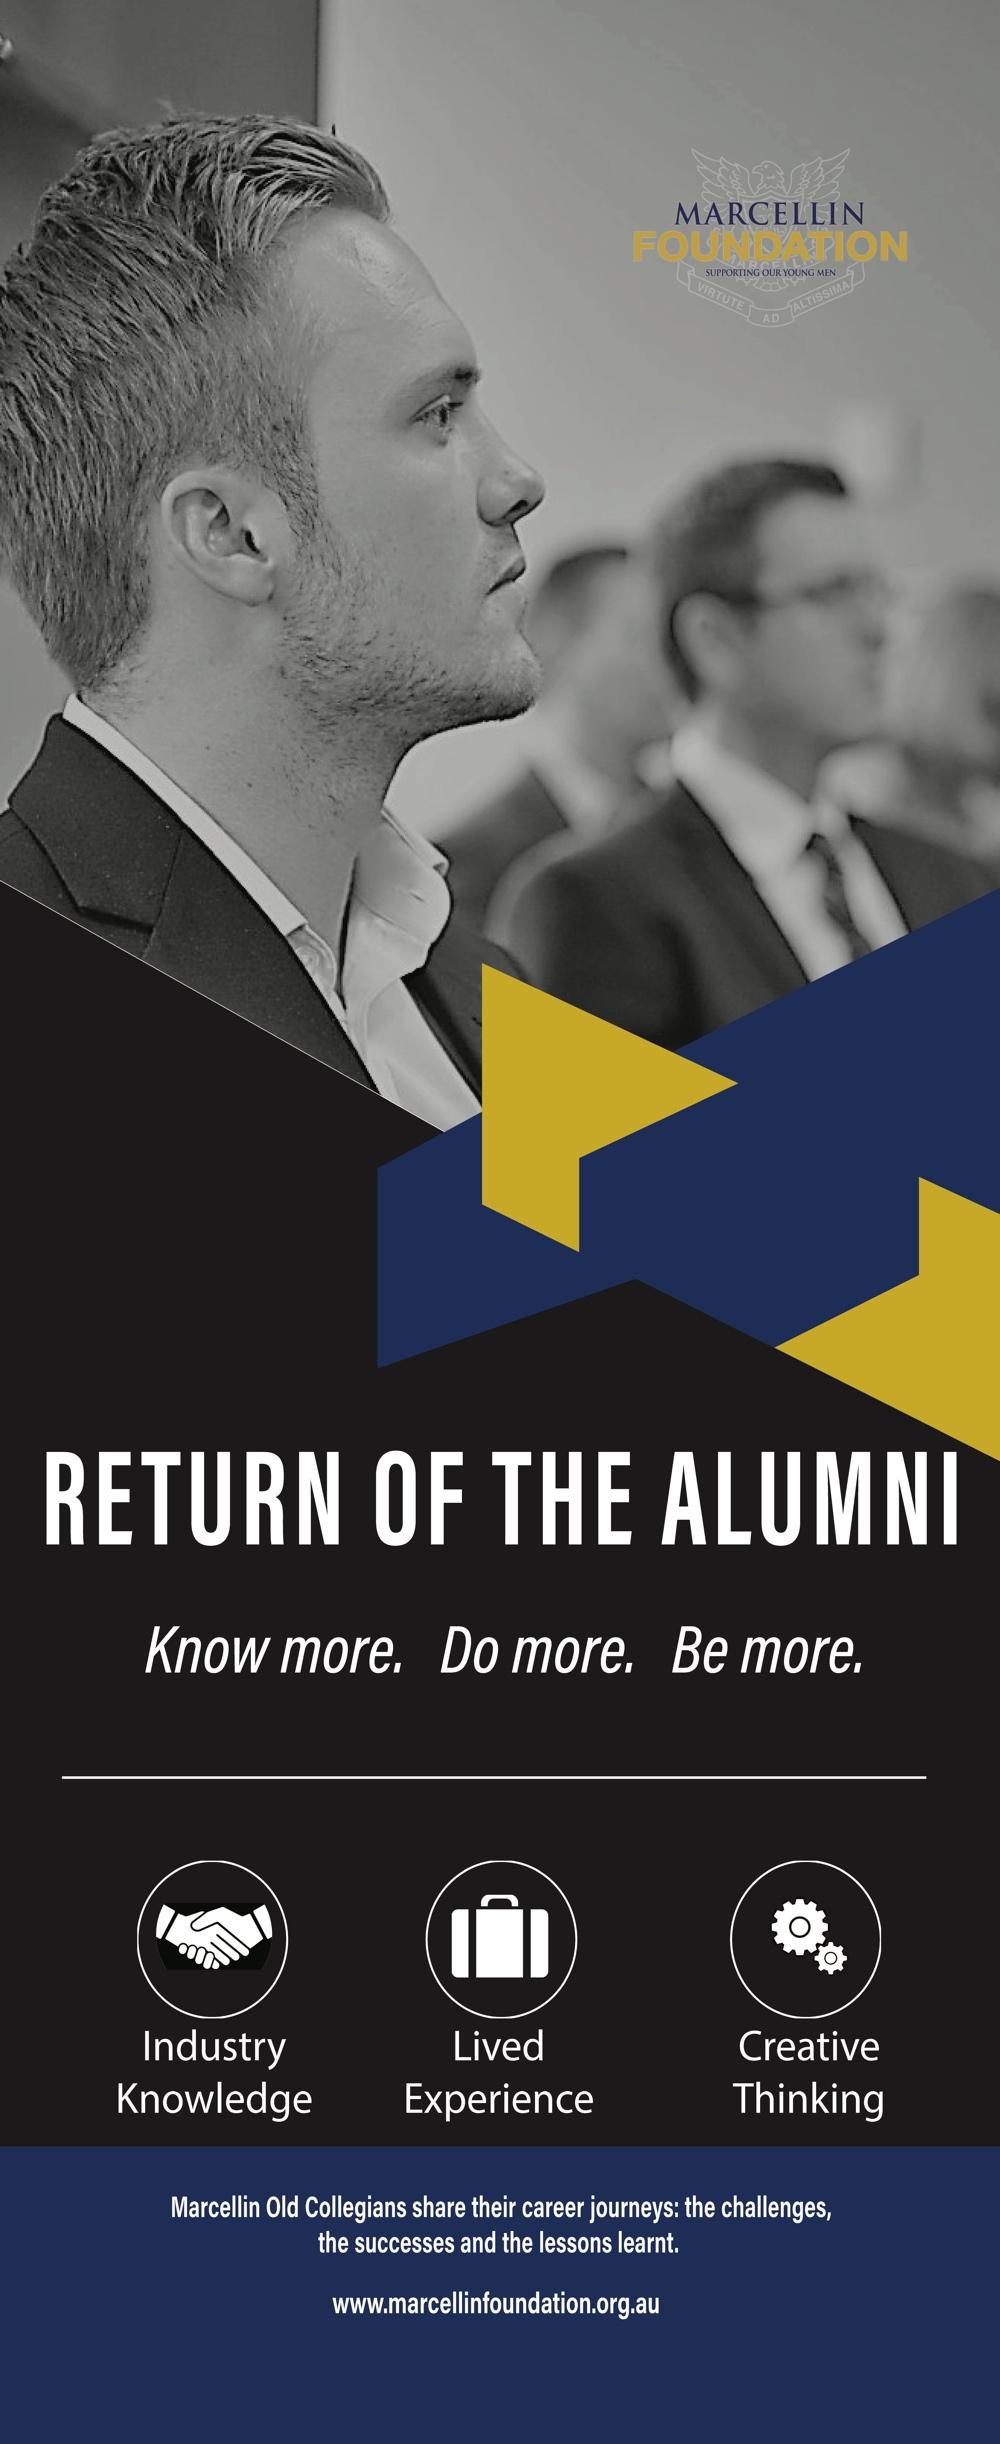 Return of the Alumni Corporate Roll-up Banner - Alt 1.jpg